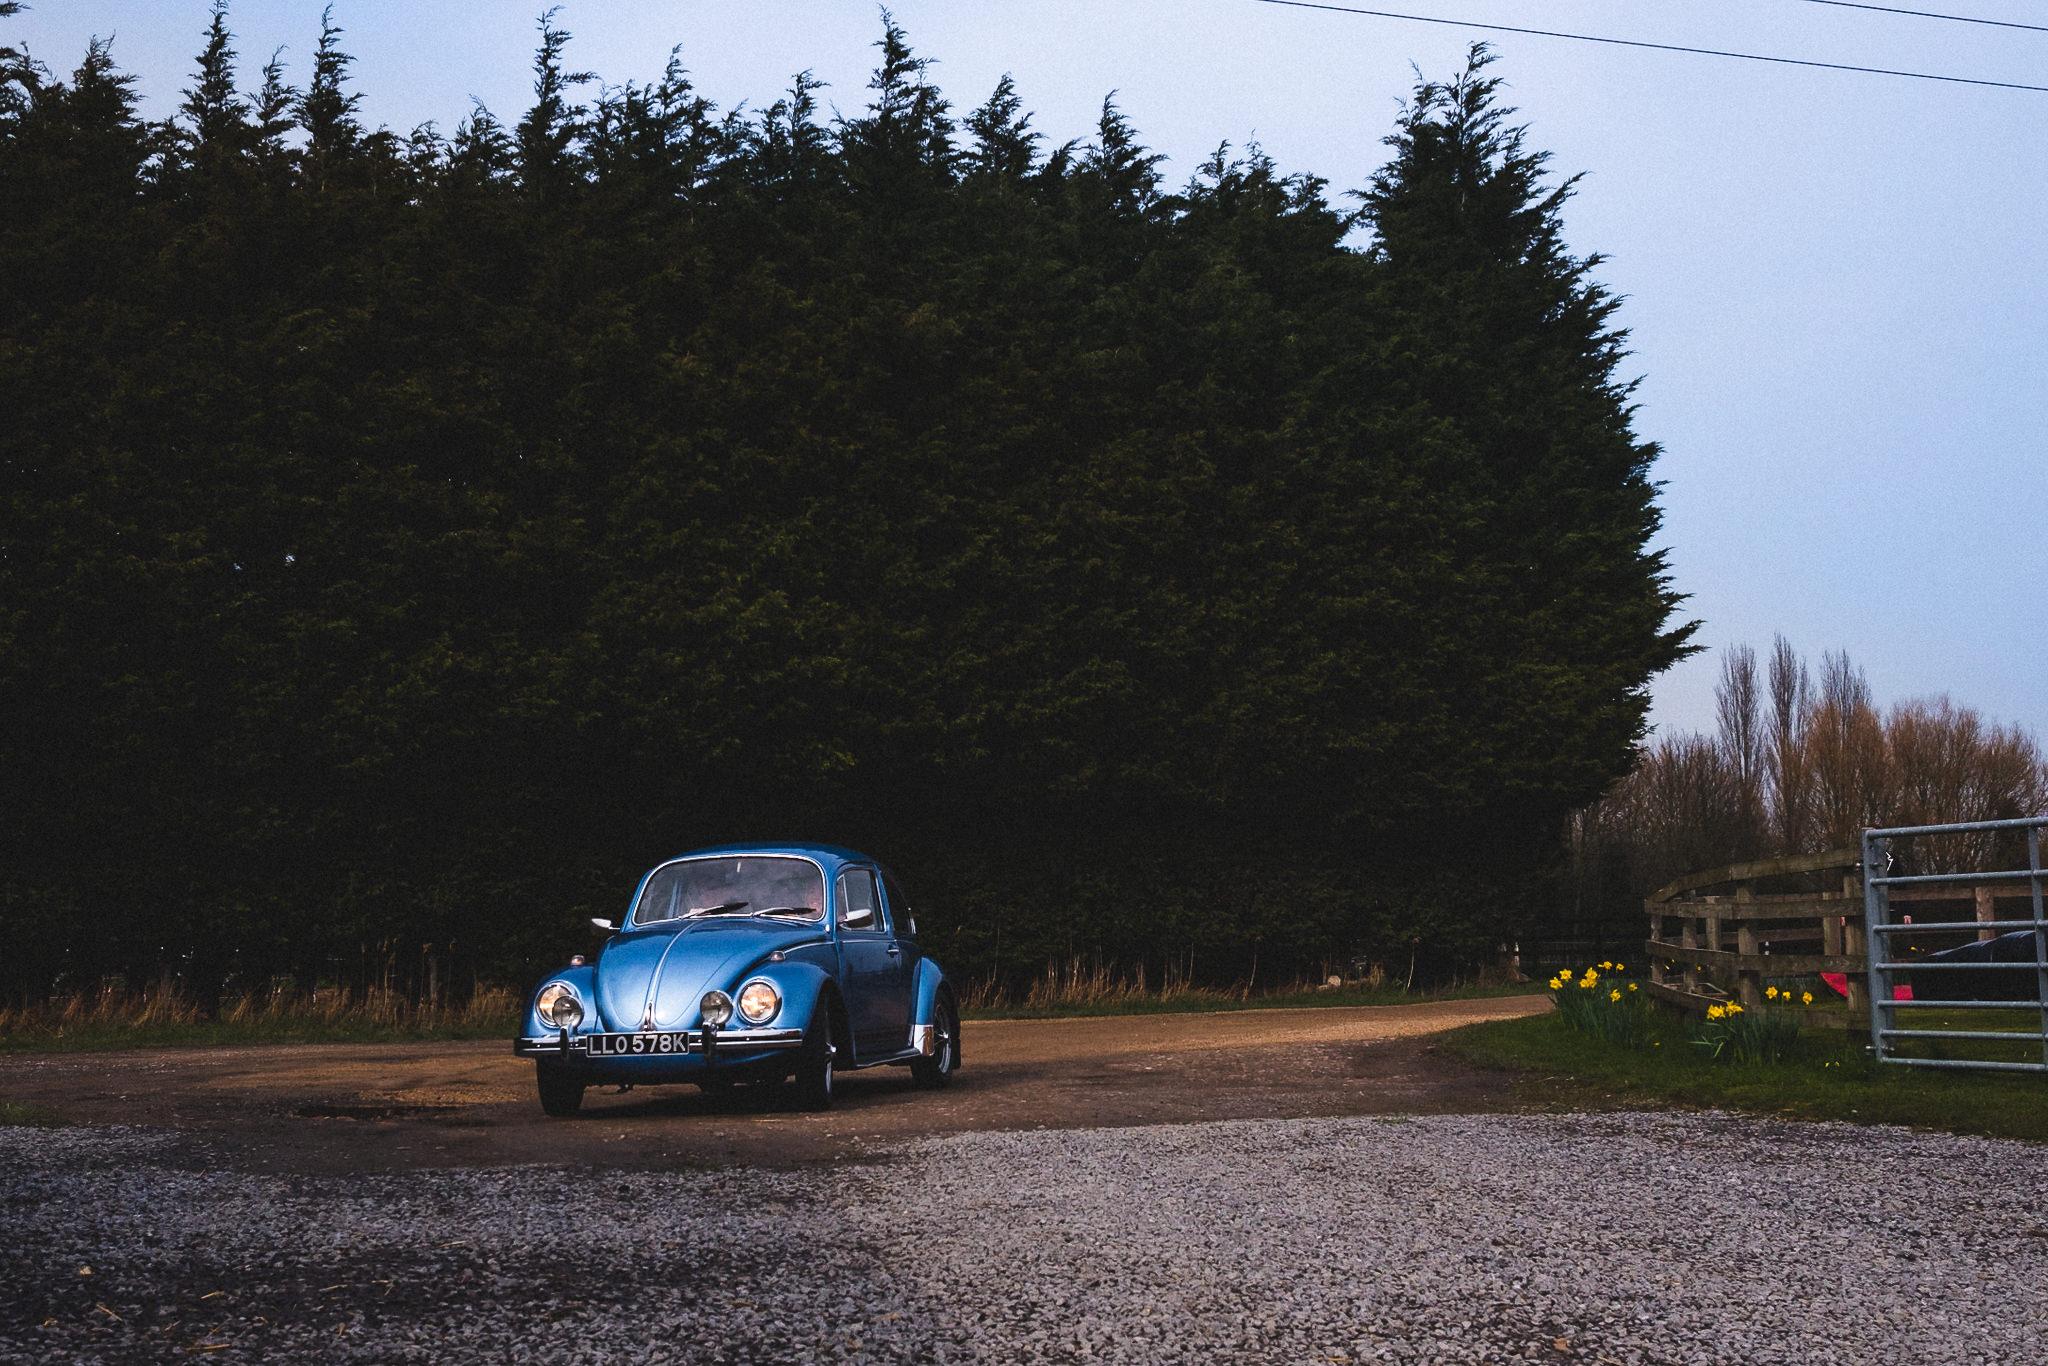 Quirky bride in Vintage Beetle wedding car arriving at Berts Barrow farm